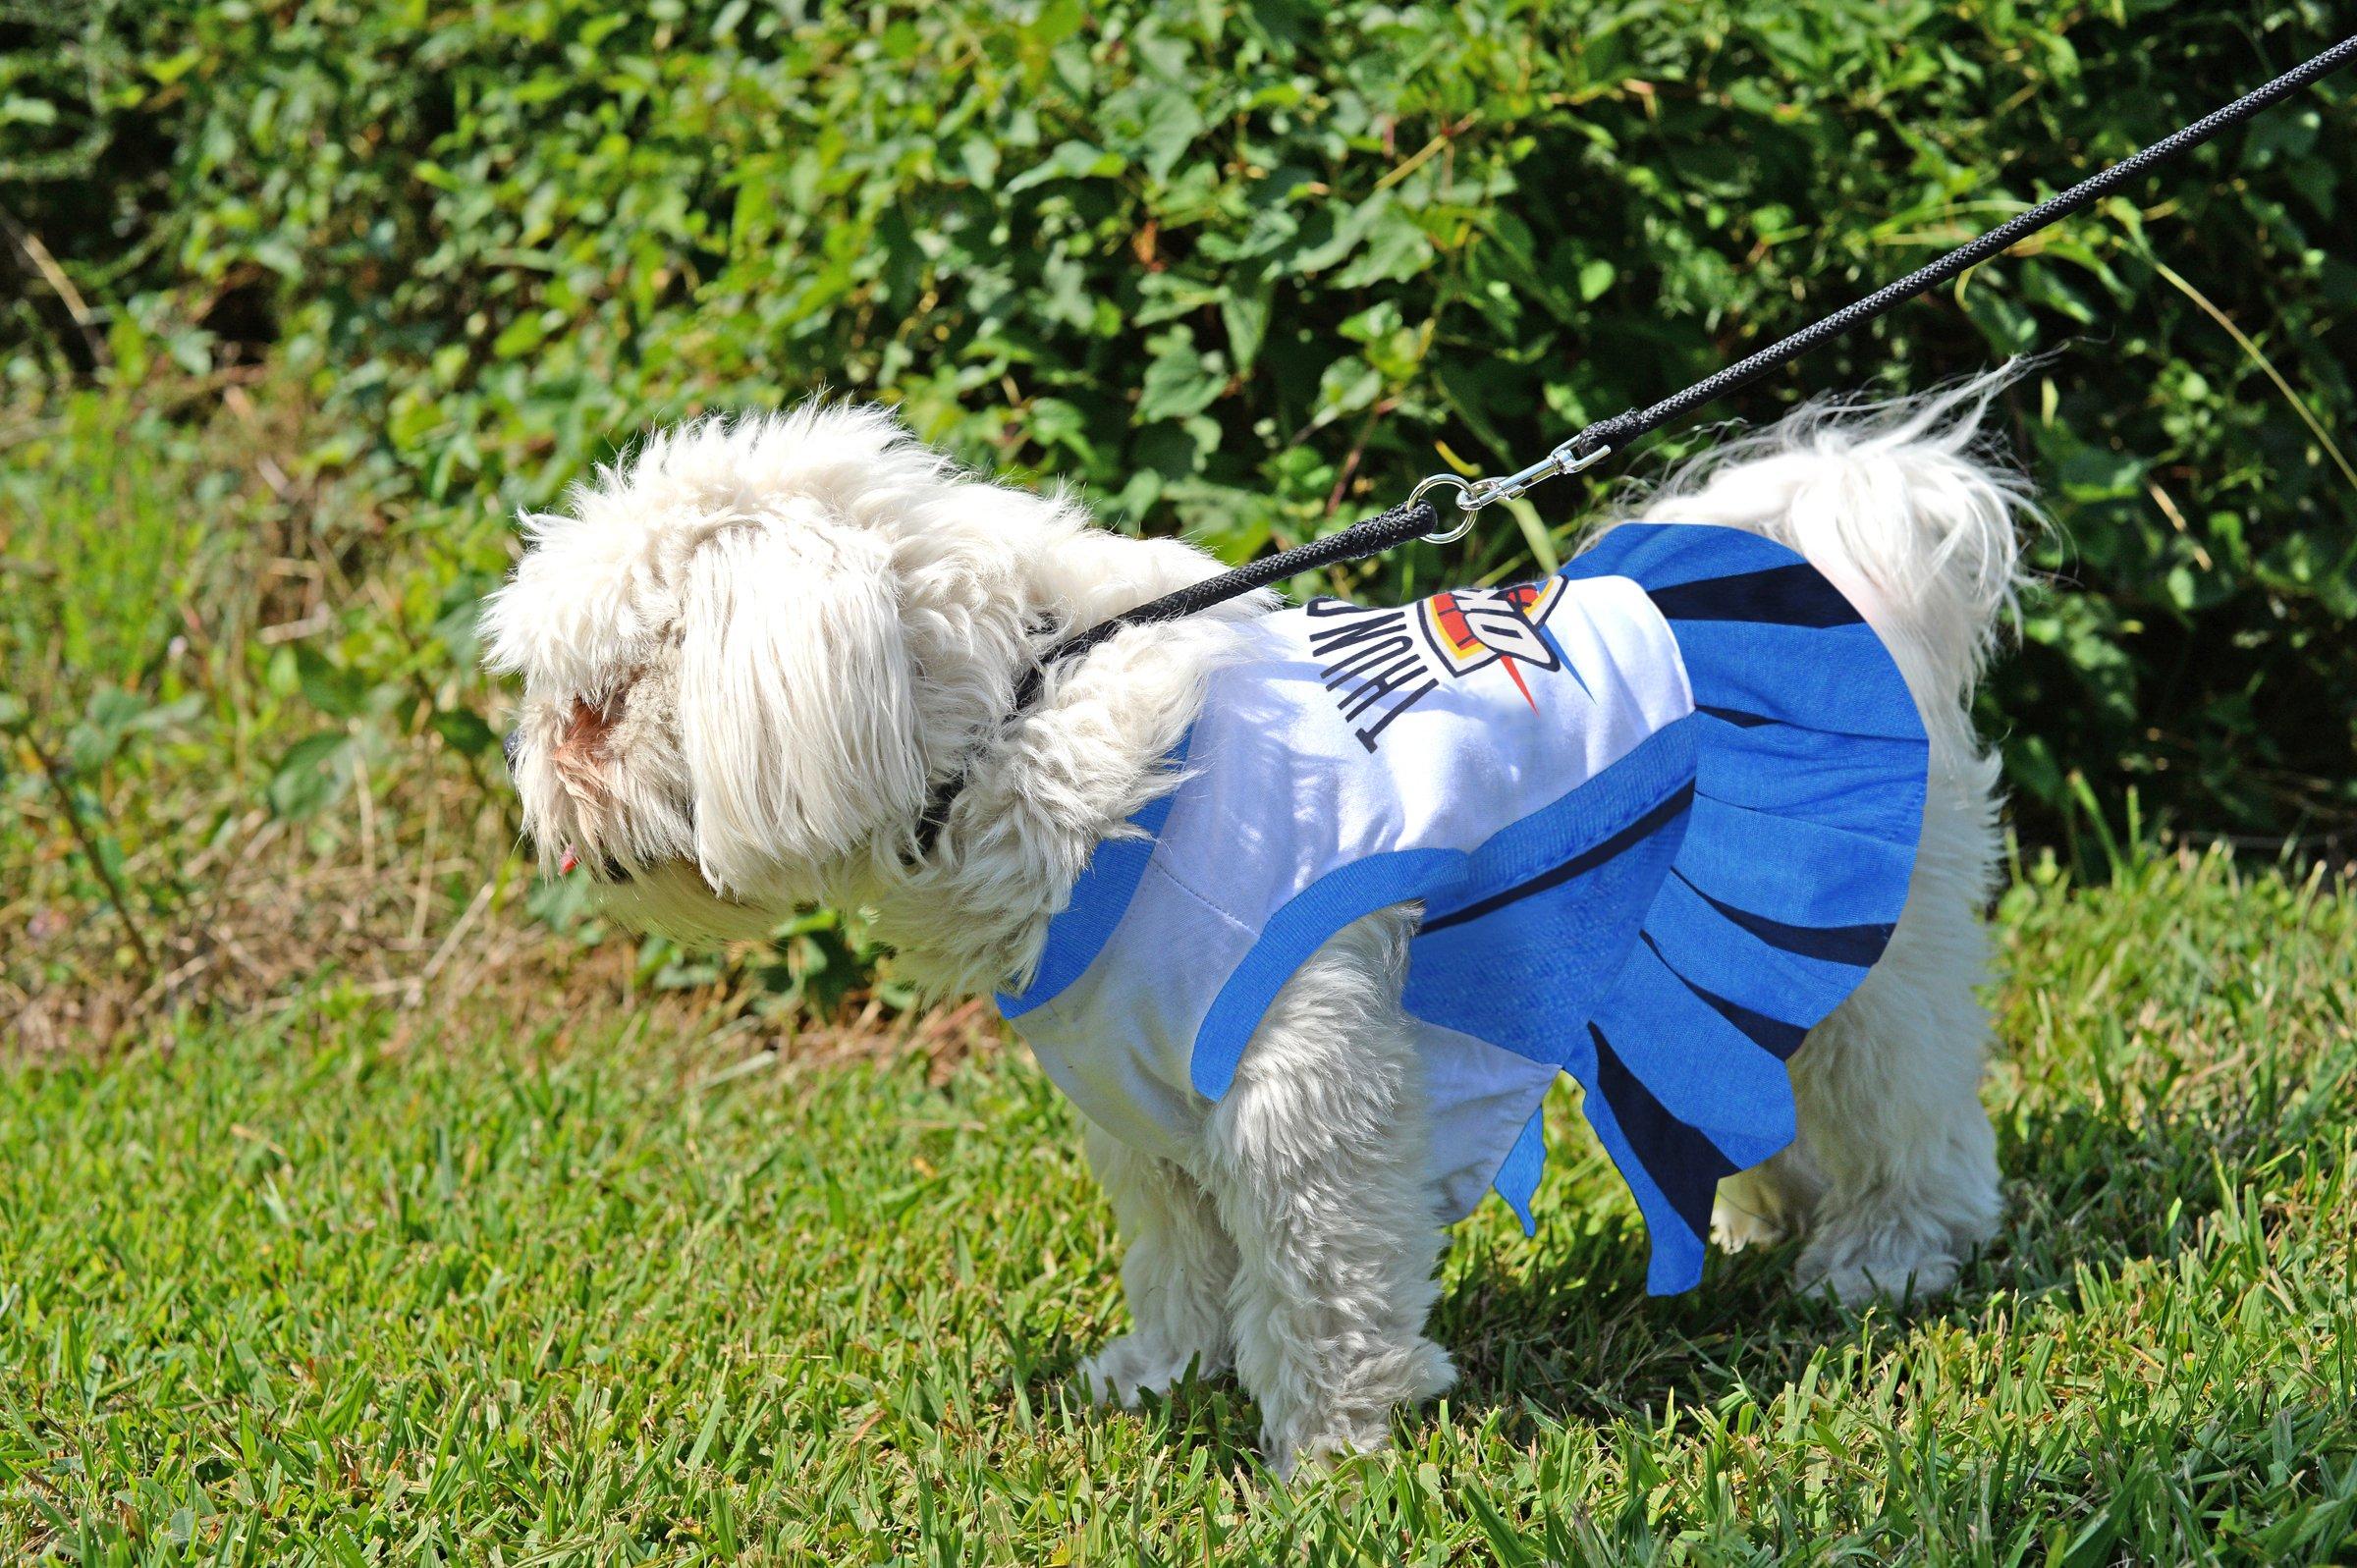 Pets First NBA Oklahoma City Thunder Dog Cheerleader Dress, Medium by Pets First (Image #4)